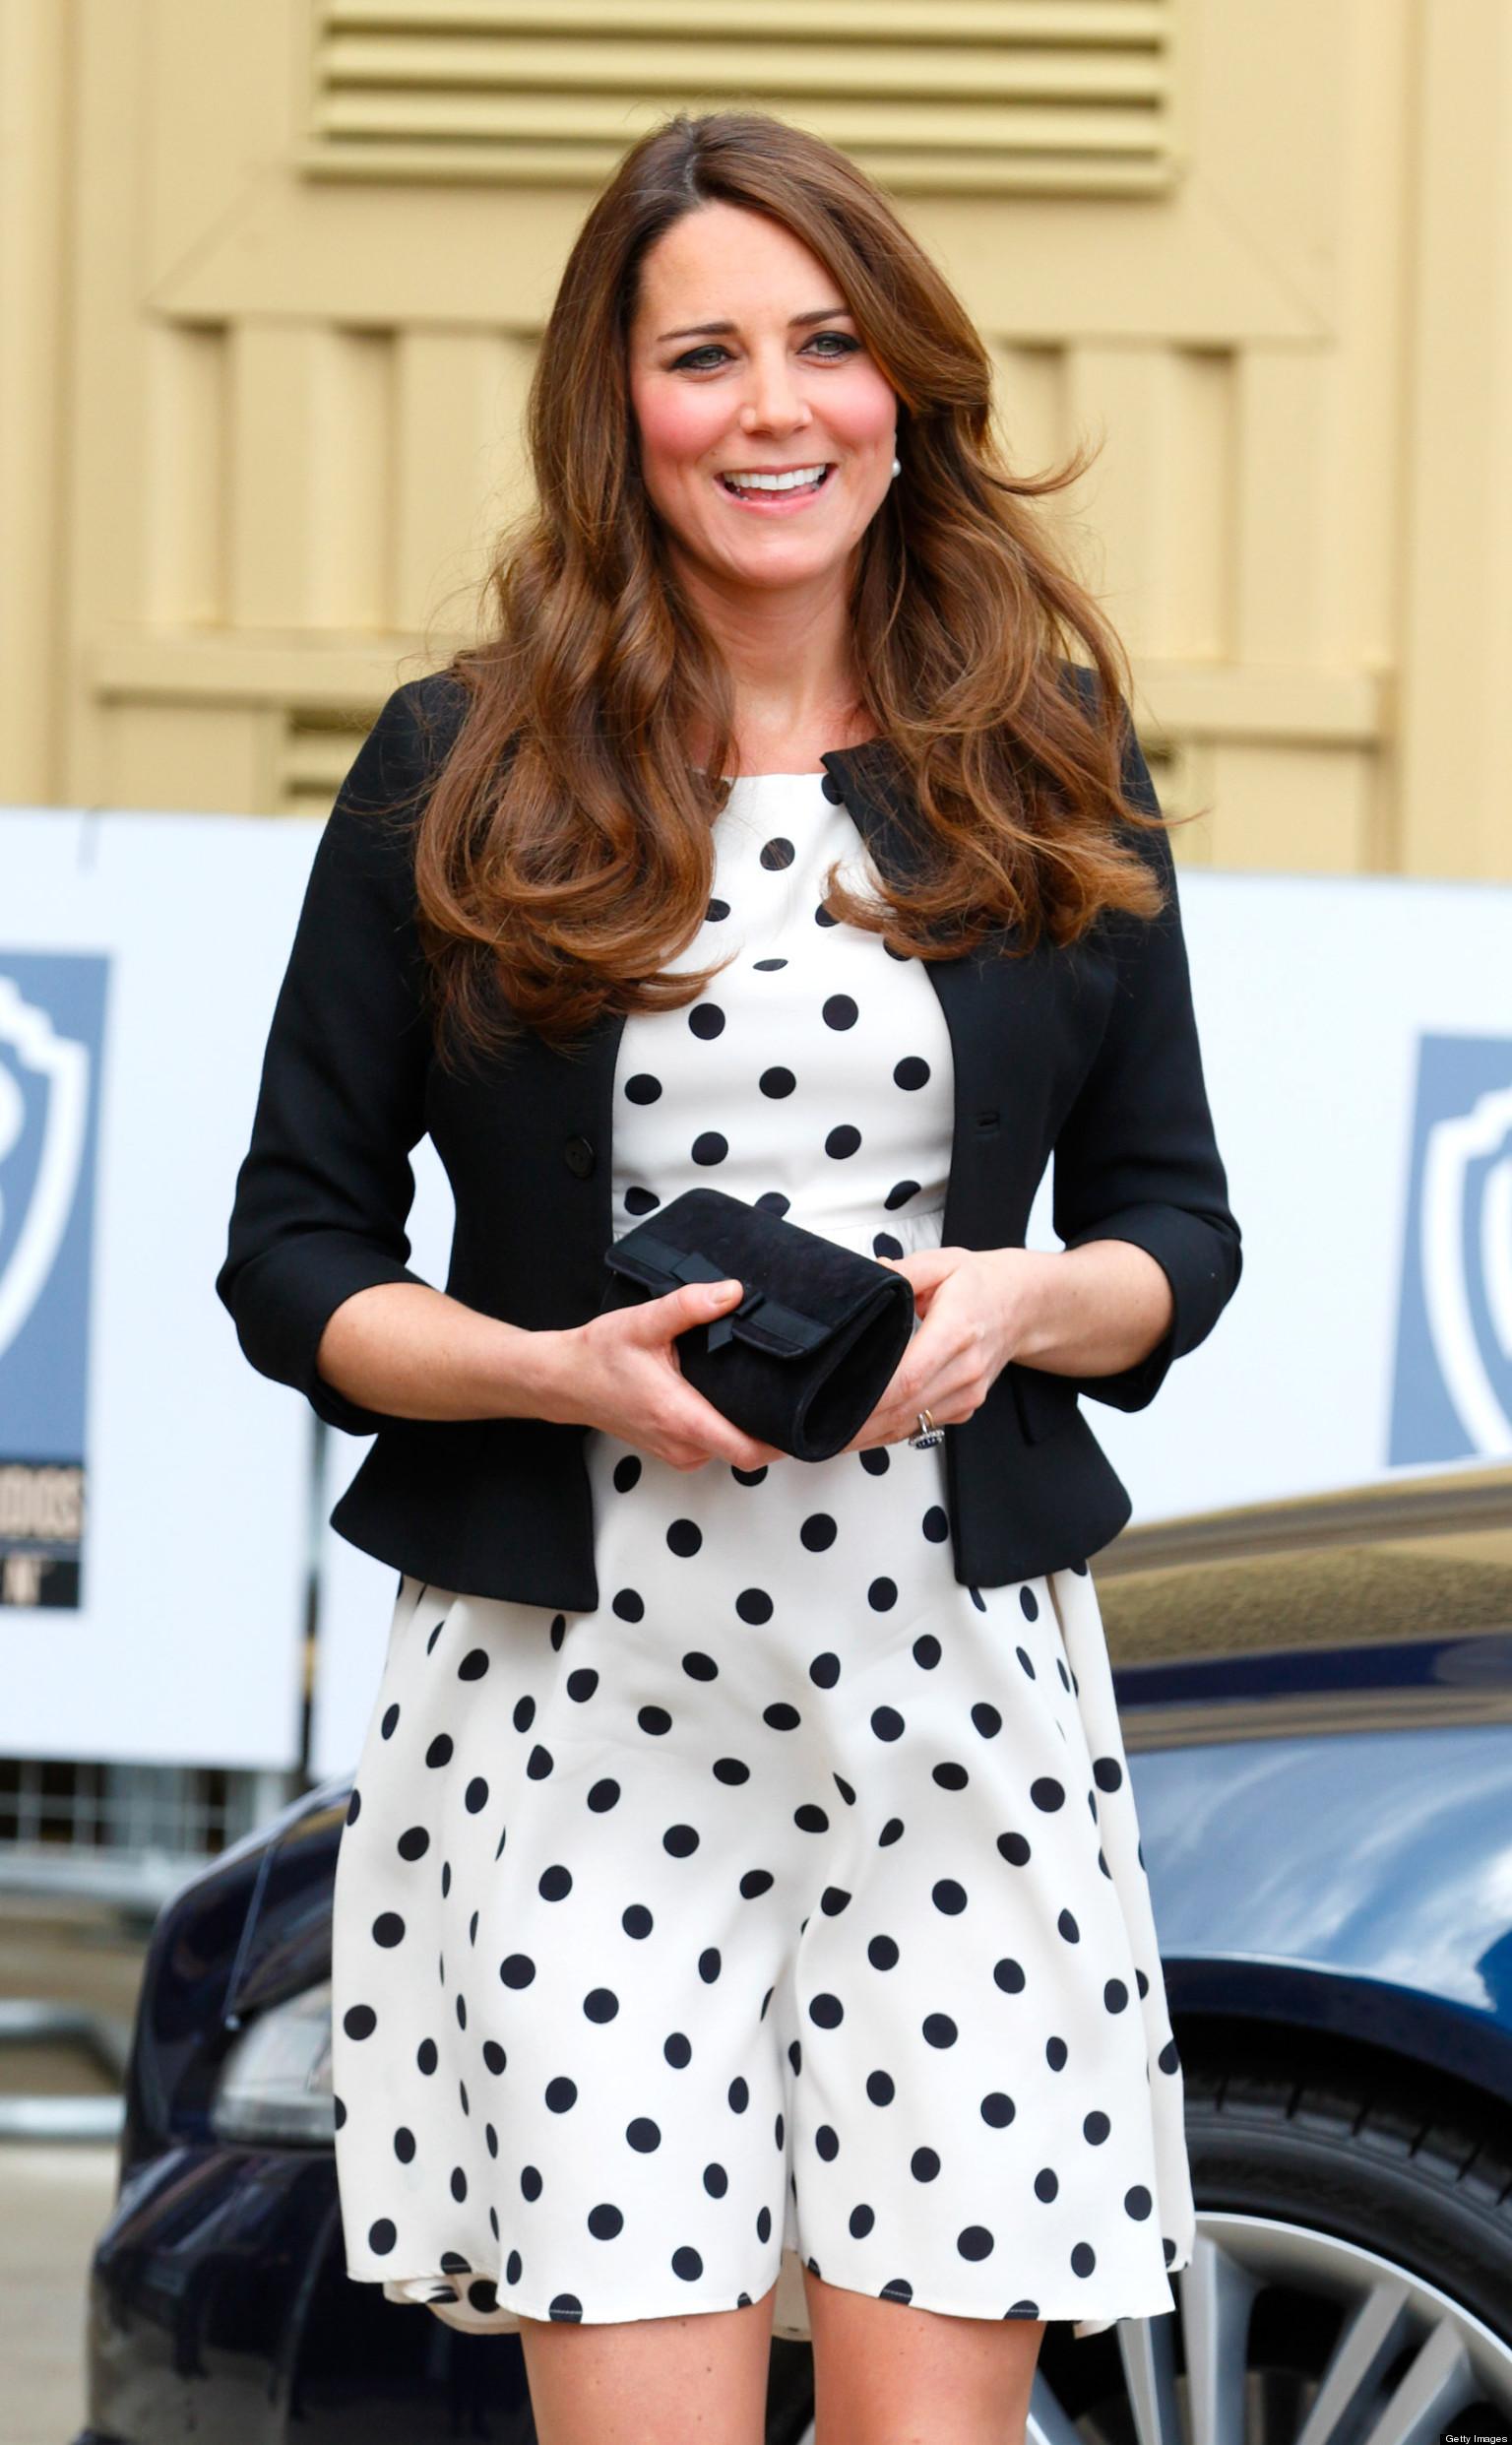 Kate Middleton Dons Polka Dot Dress From Topshop For Harry